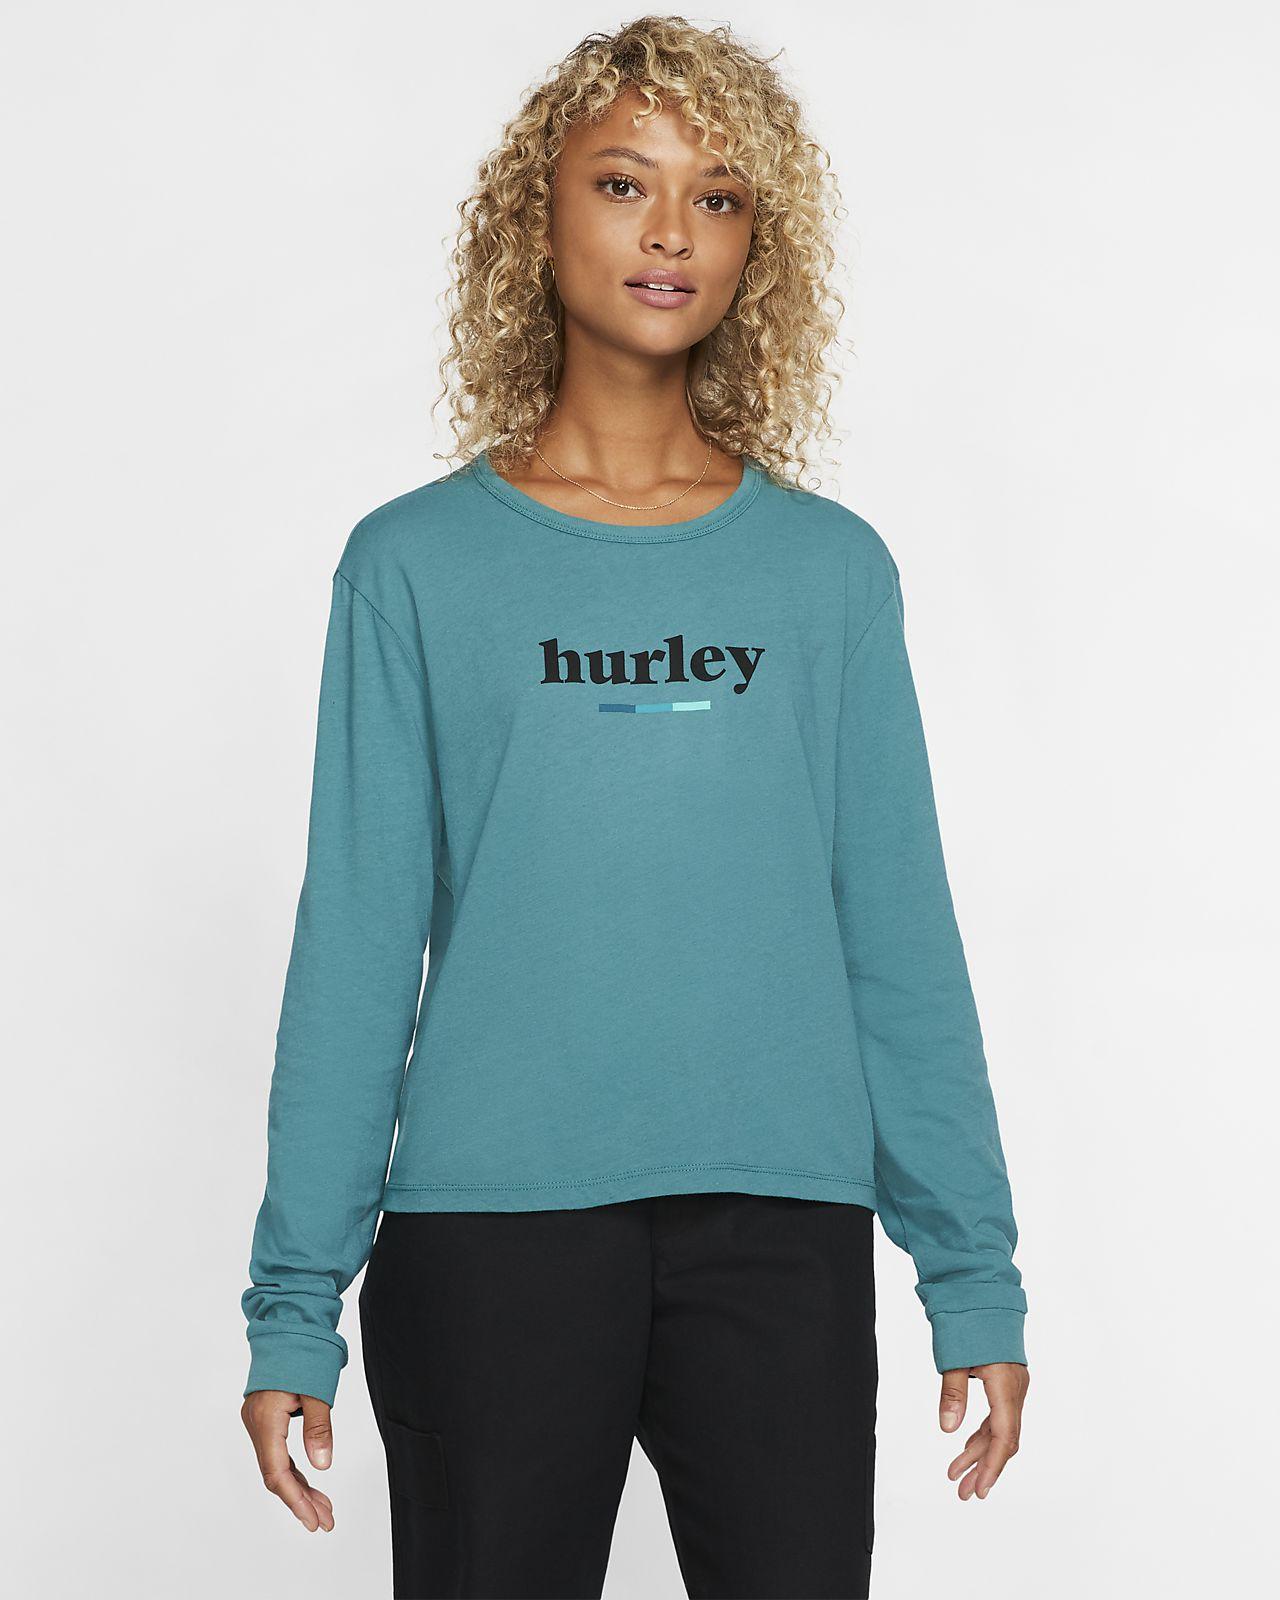 Hurley Pompel Perfect Langarm-T-Shirt für Damen